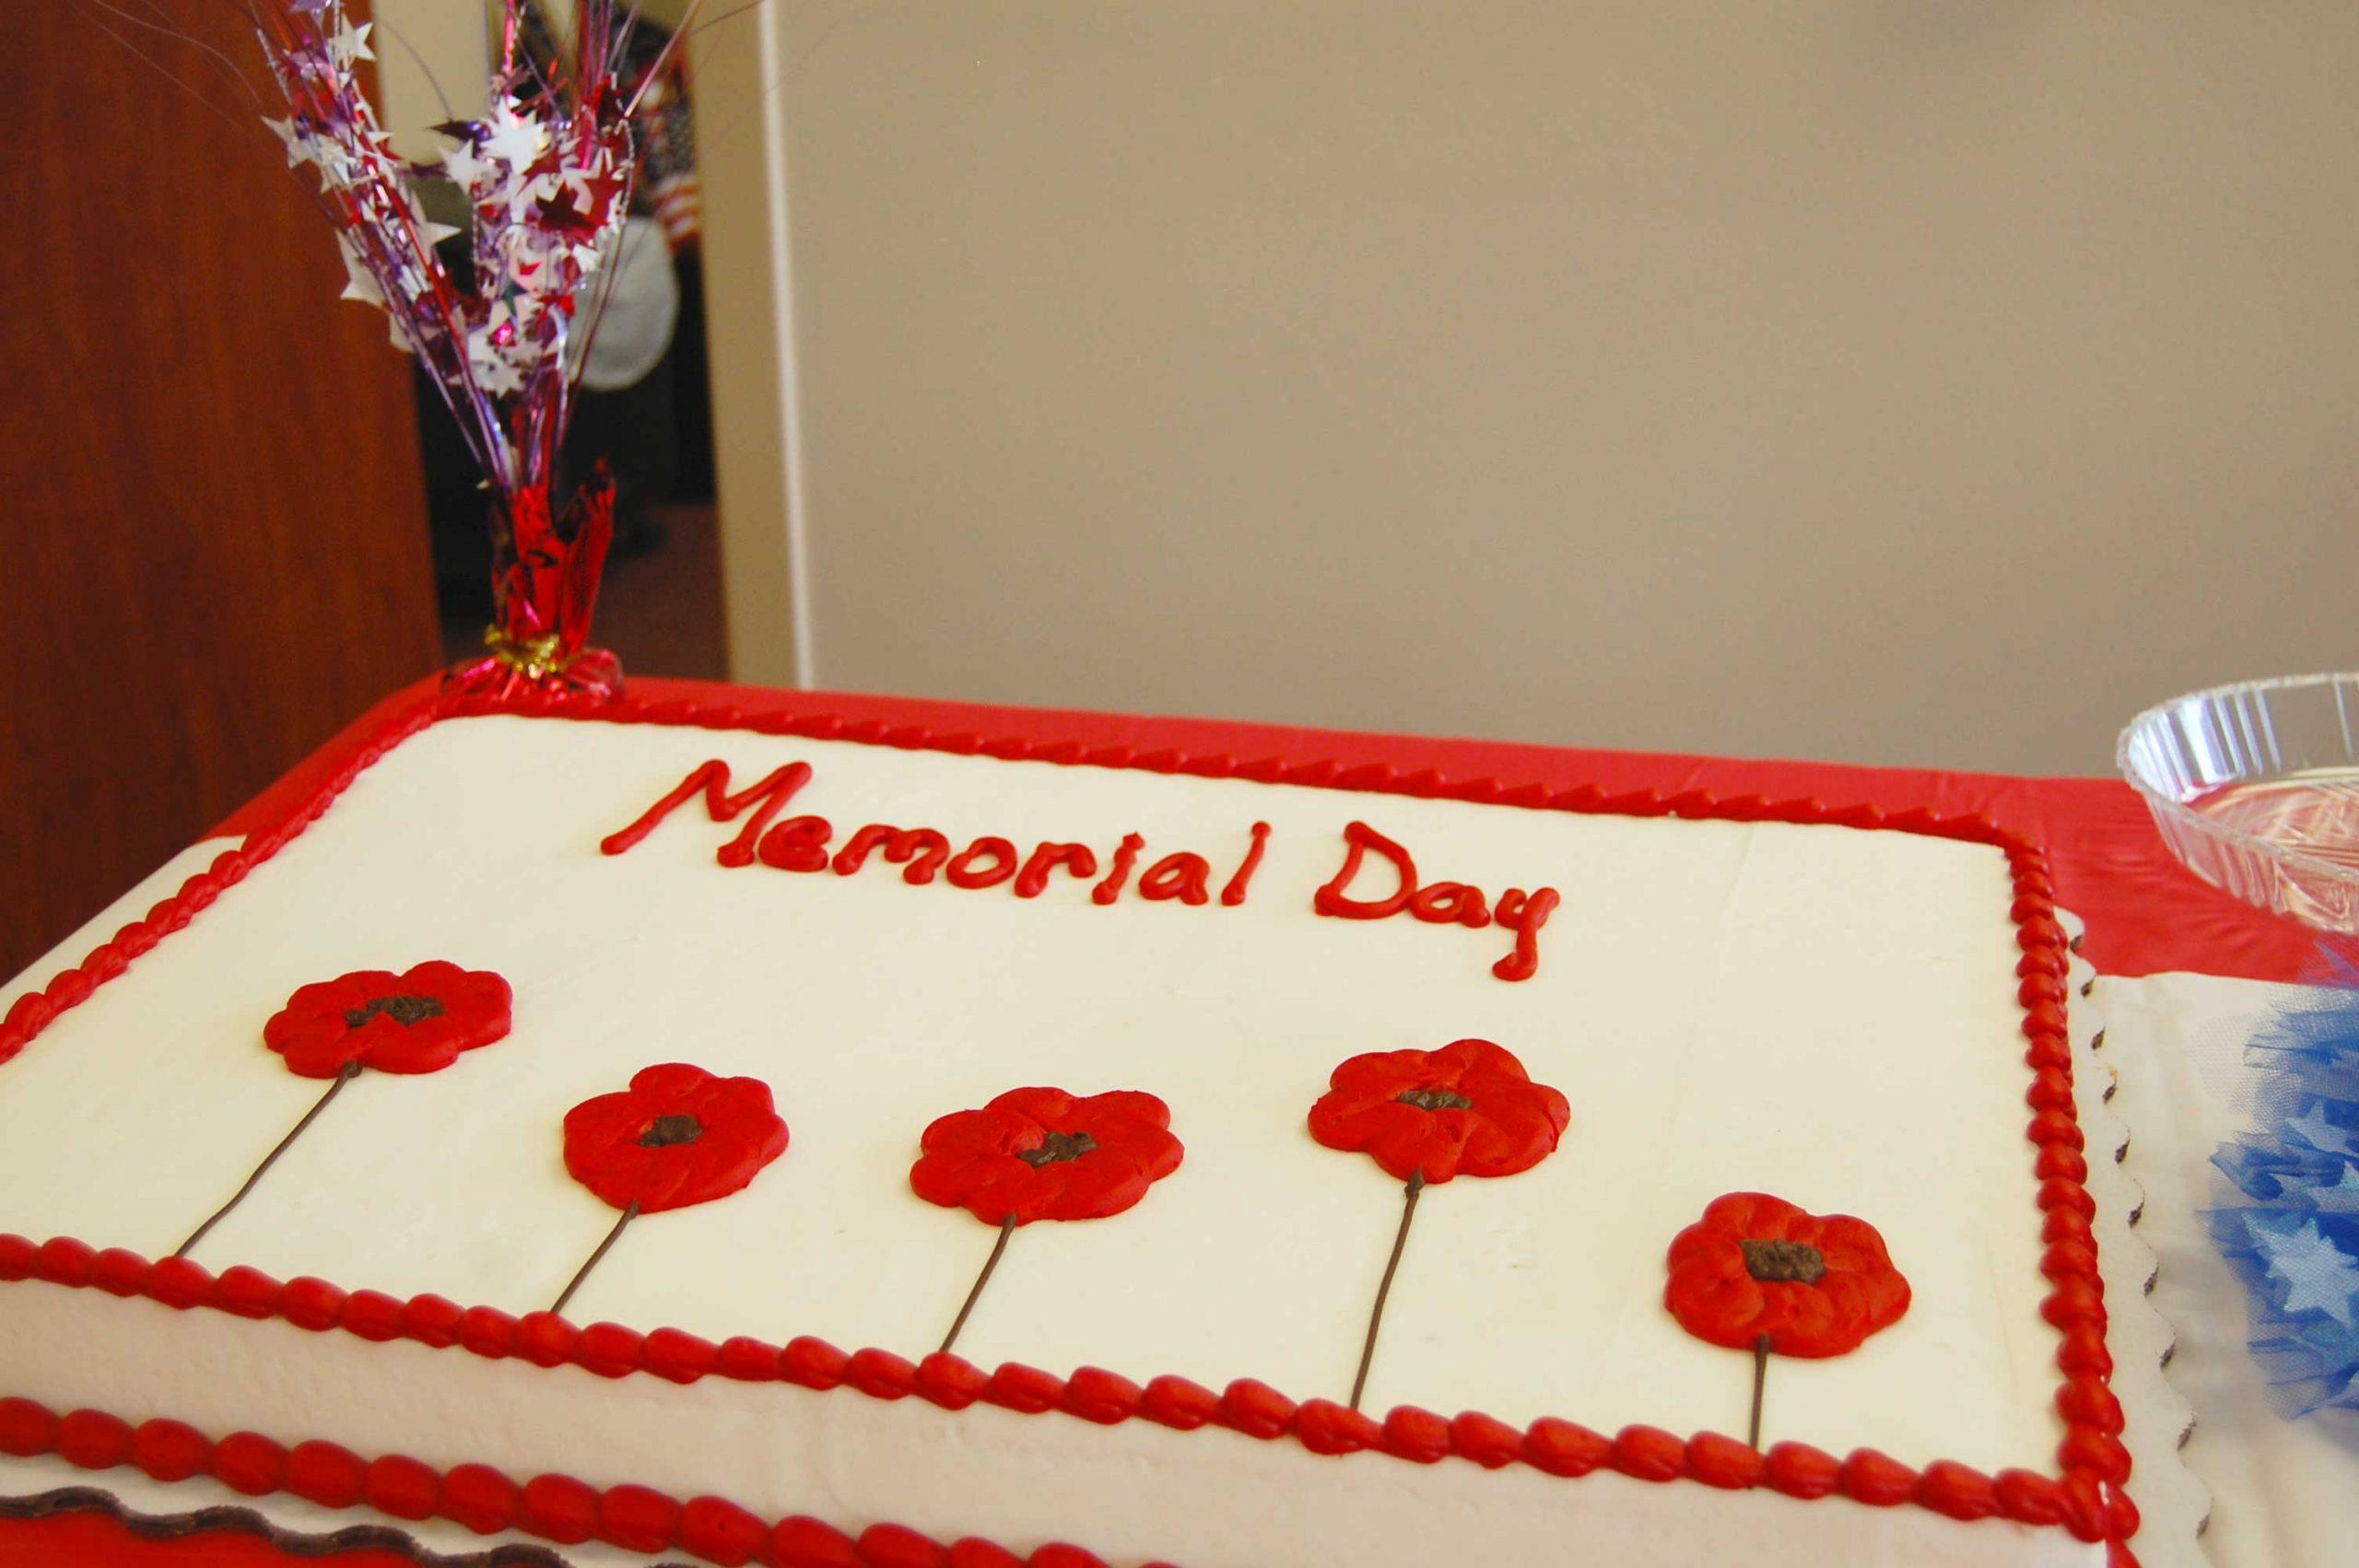 Central Louisiana Veterans Cemetery Memorial Day Event 2018